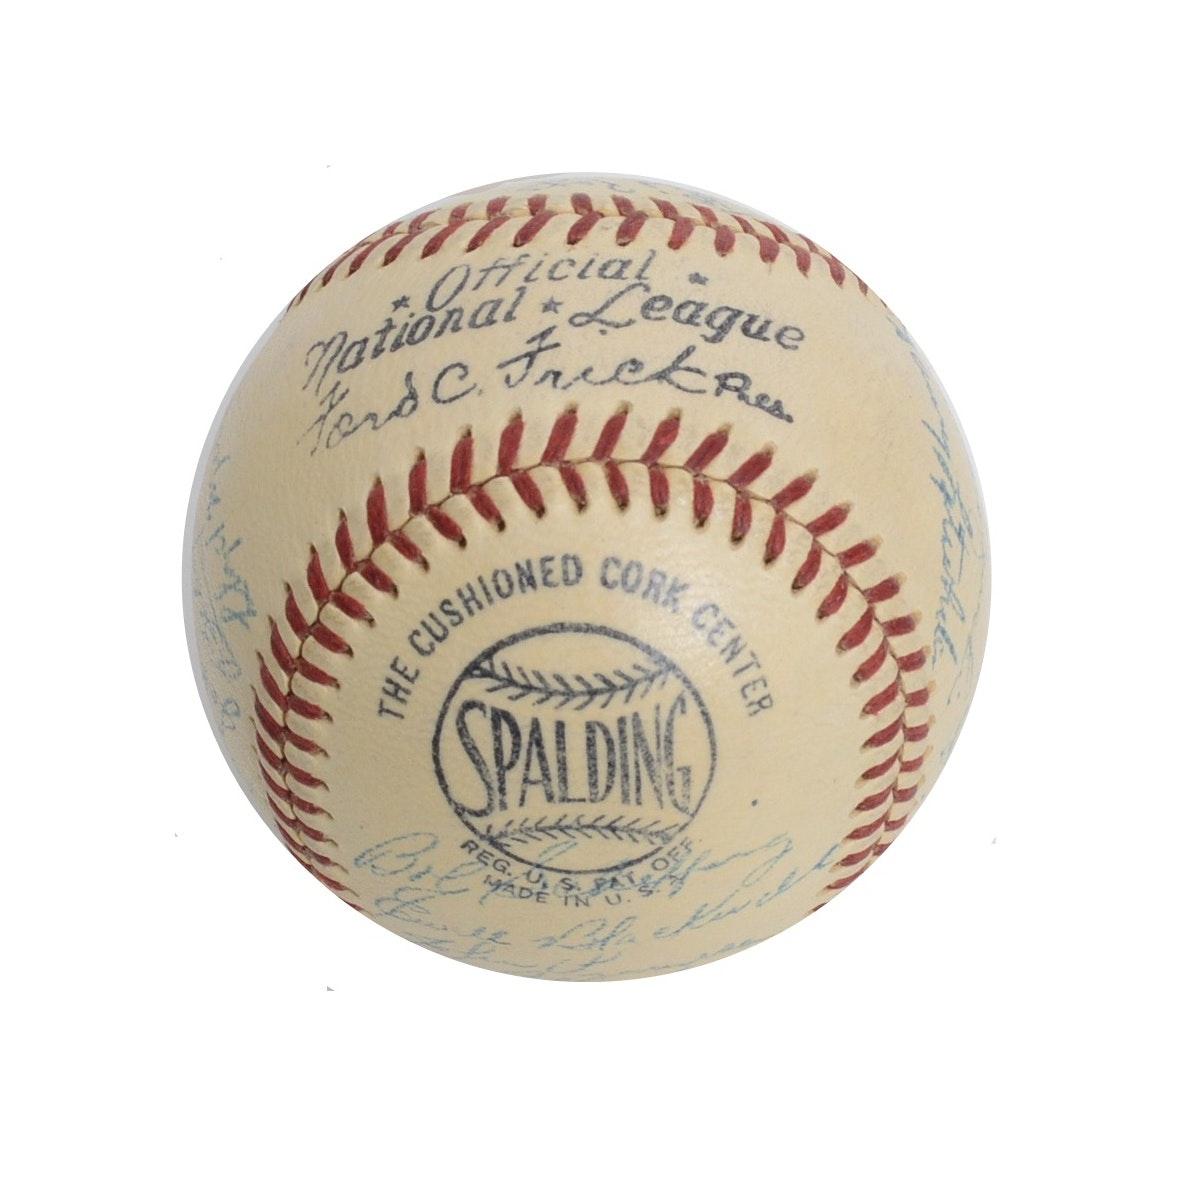 1951 Cincinnati Reds Team Autographed Baseball